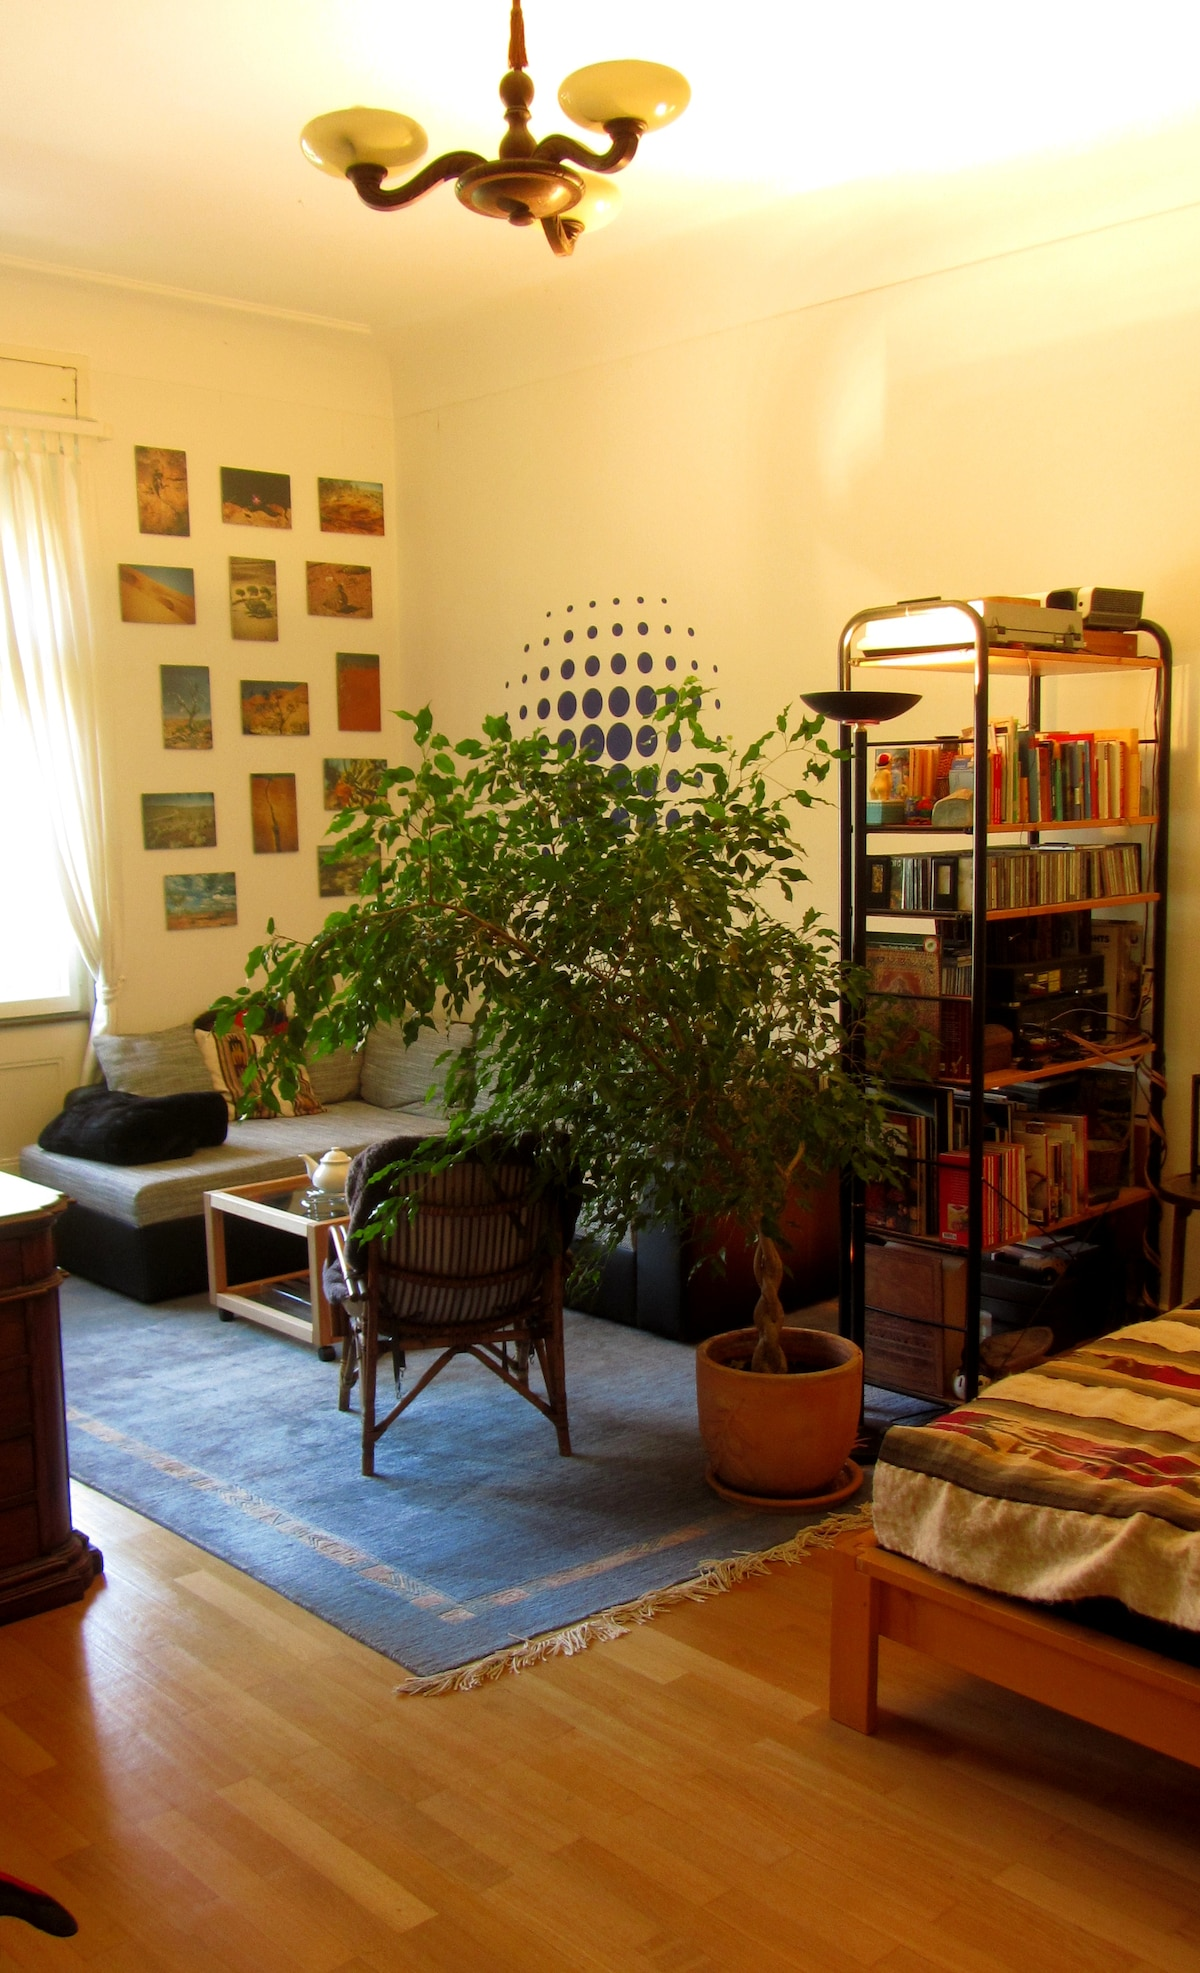 30sqm room in shared flat, sleeps 2